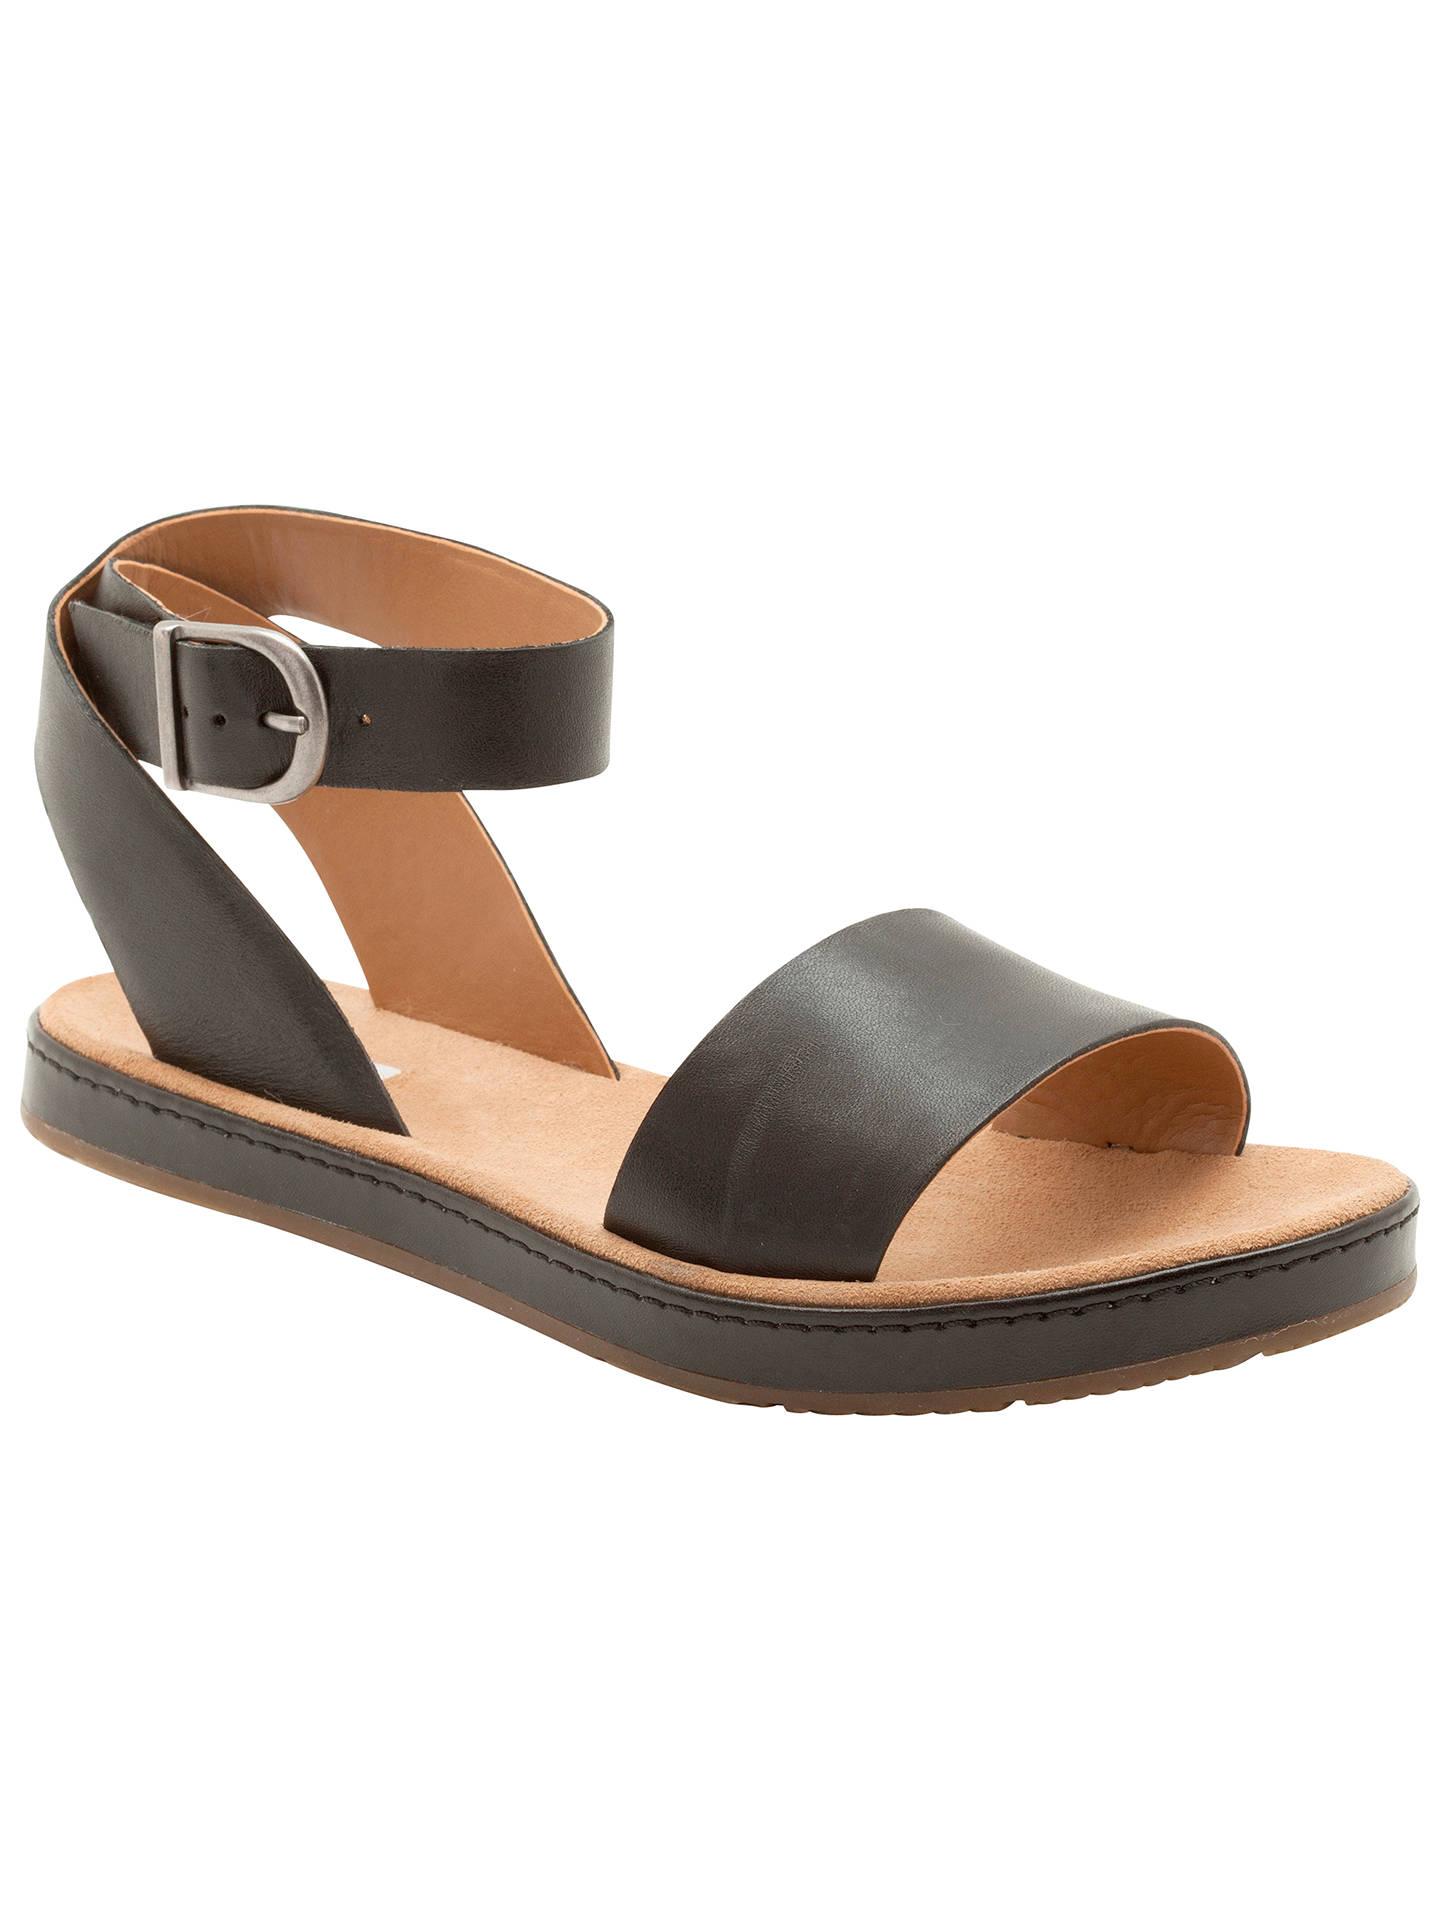 be9b0c5dadb4c Clarks Romantic Moon Leather Sandals at John Lewis   Partners